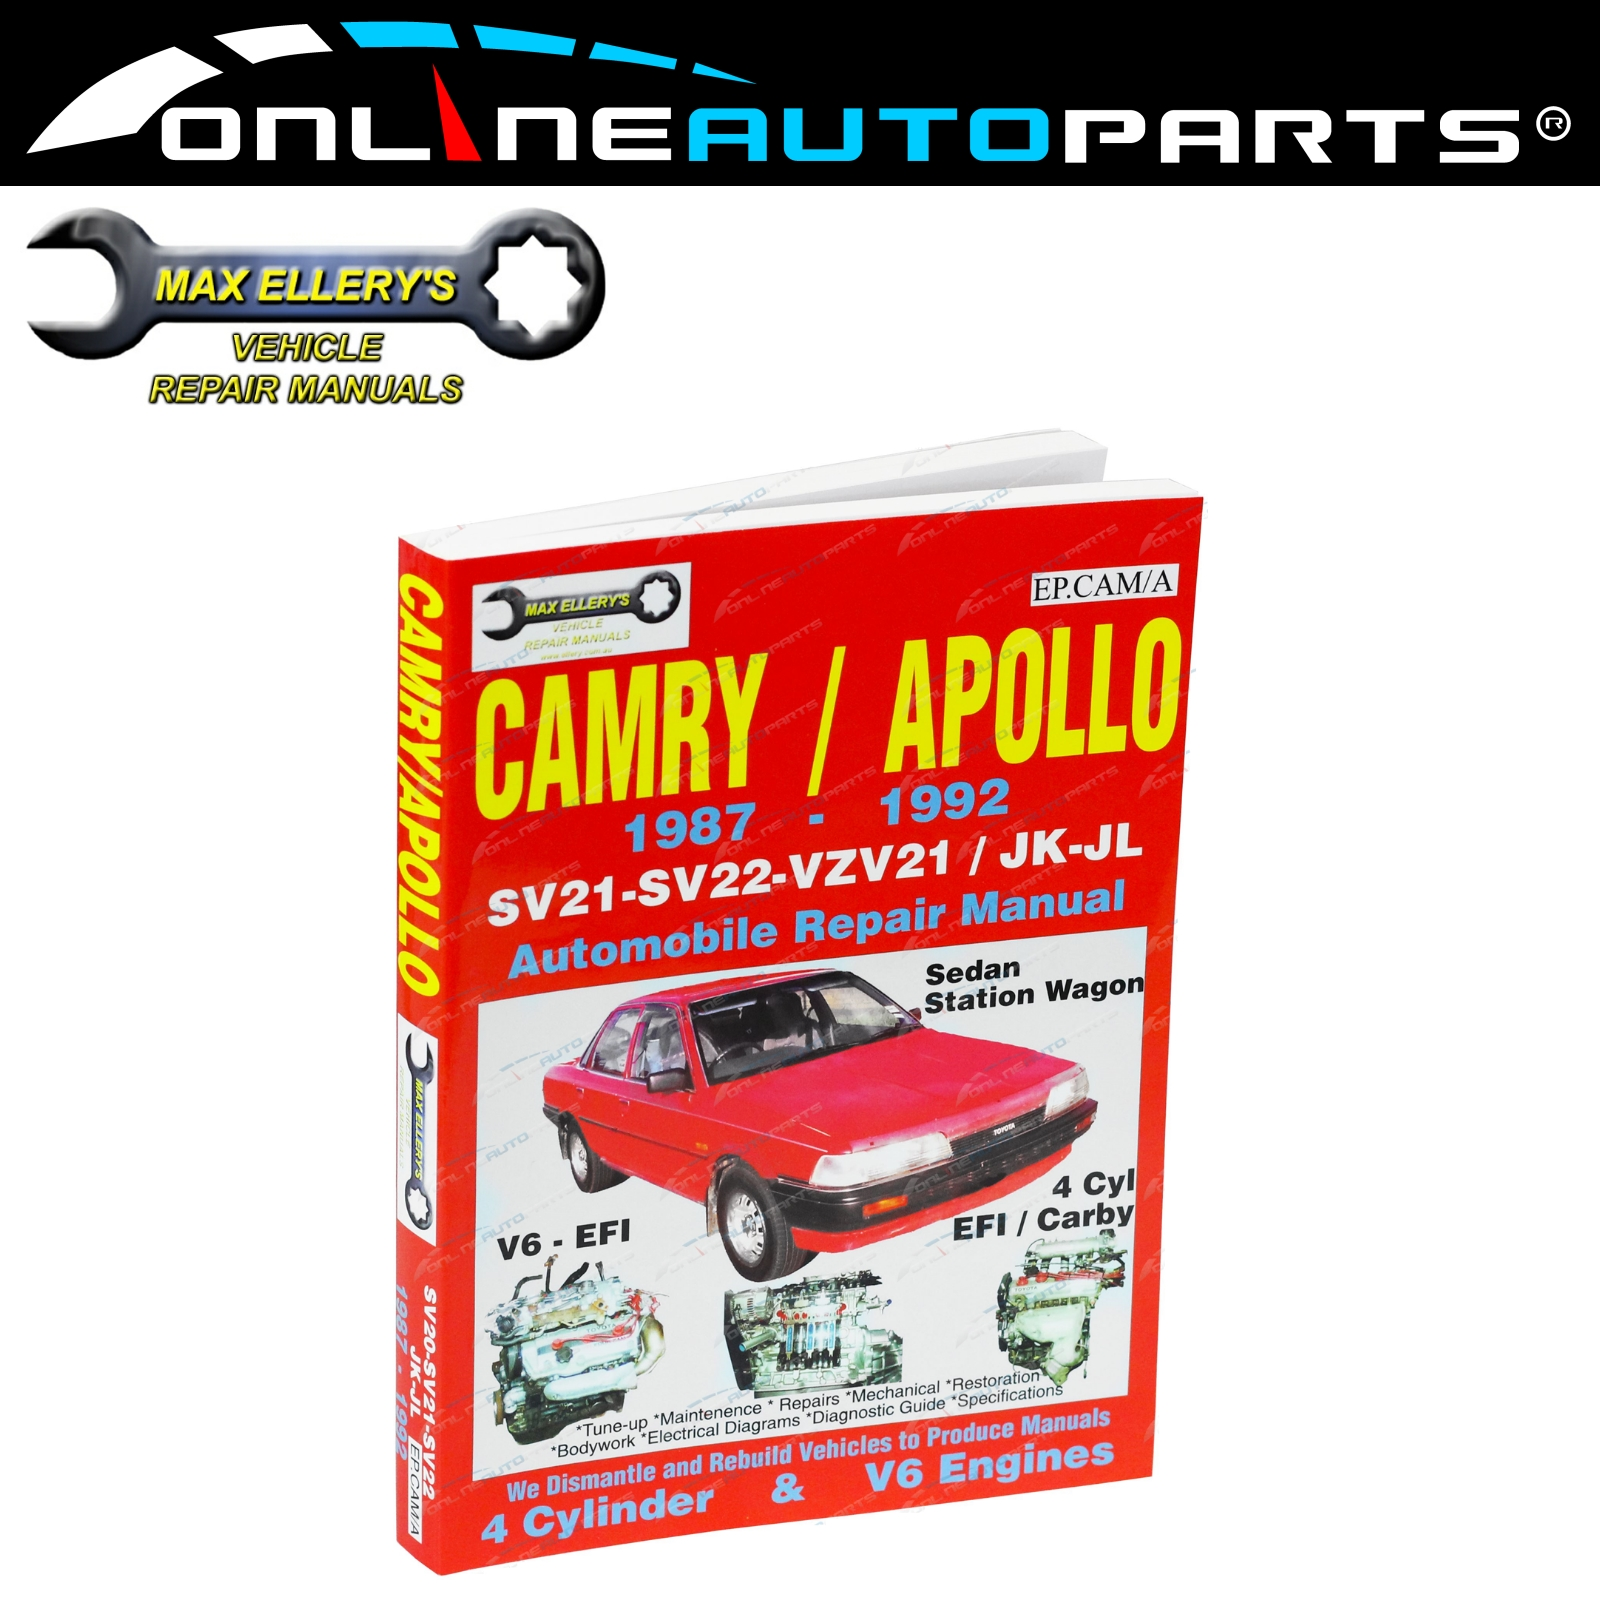 Workshop Car Repair Manual Camry SV21 SV22 VZN21 87-92 Book Mechanical  Service